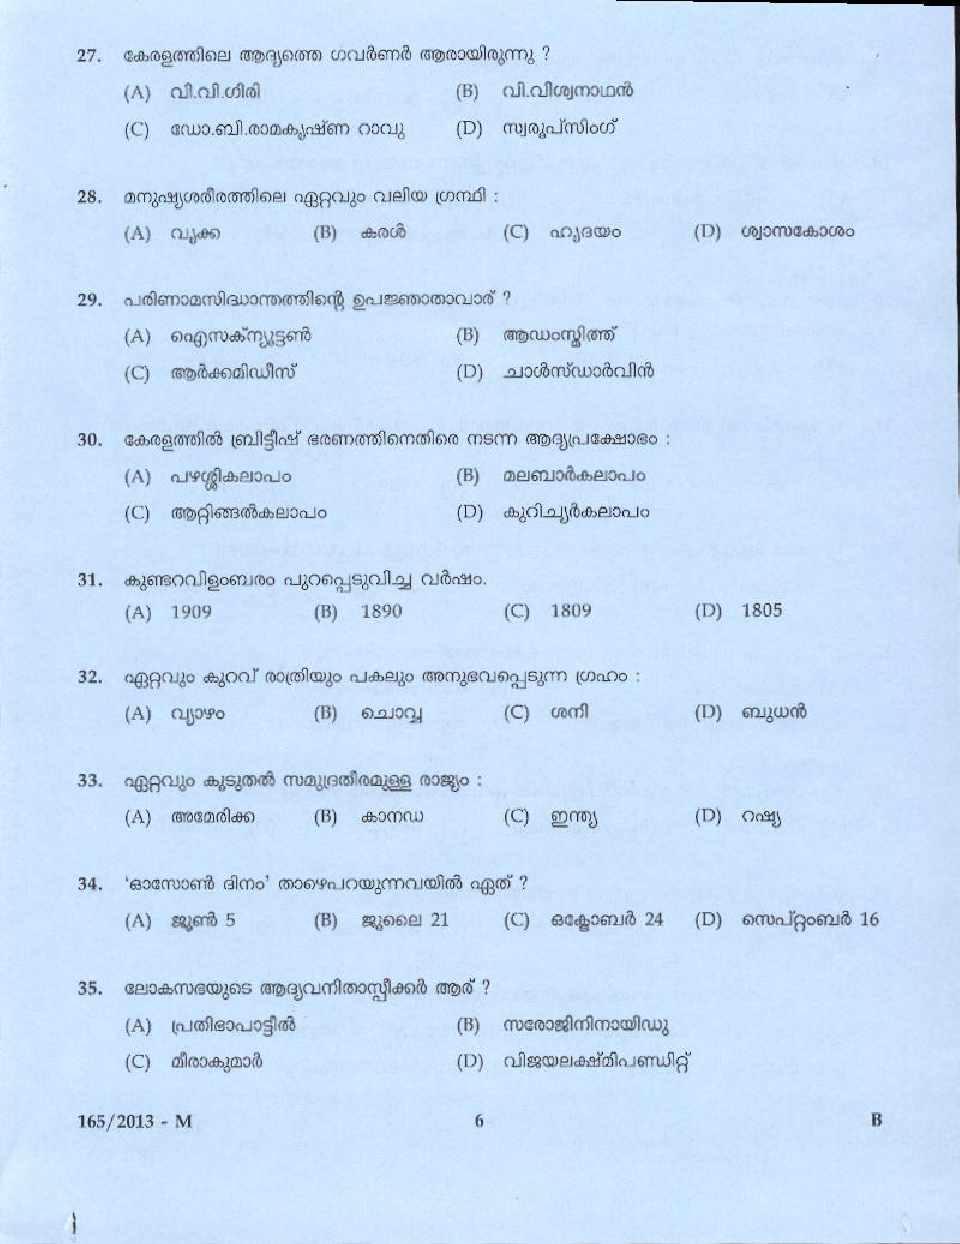 https://masterstudy.net/pdf/psc/boat-lascar-police-lift-operator-apex-societies-kscb-ltd/q_1652013-m0004.jpg